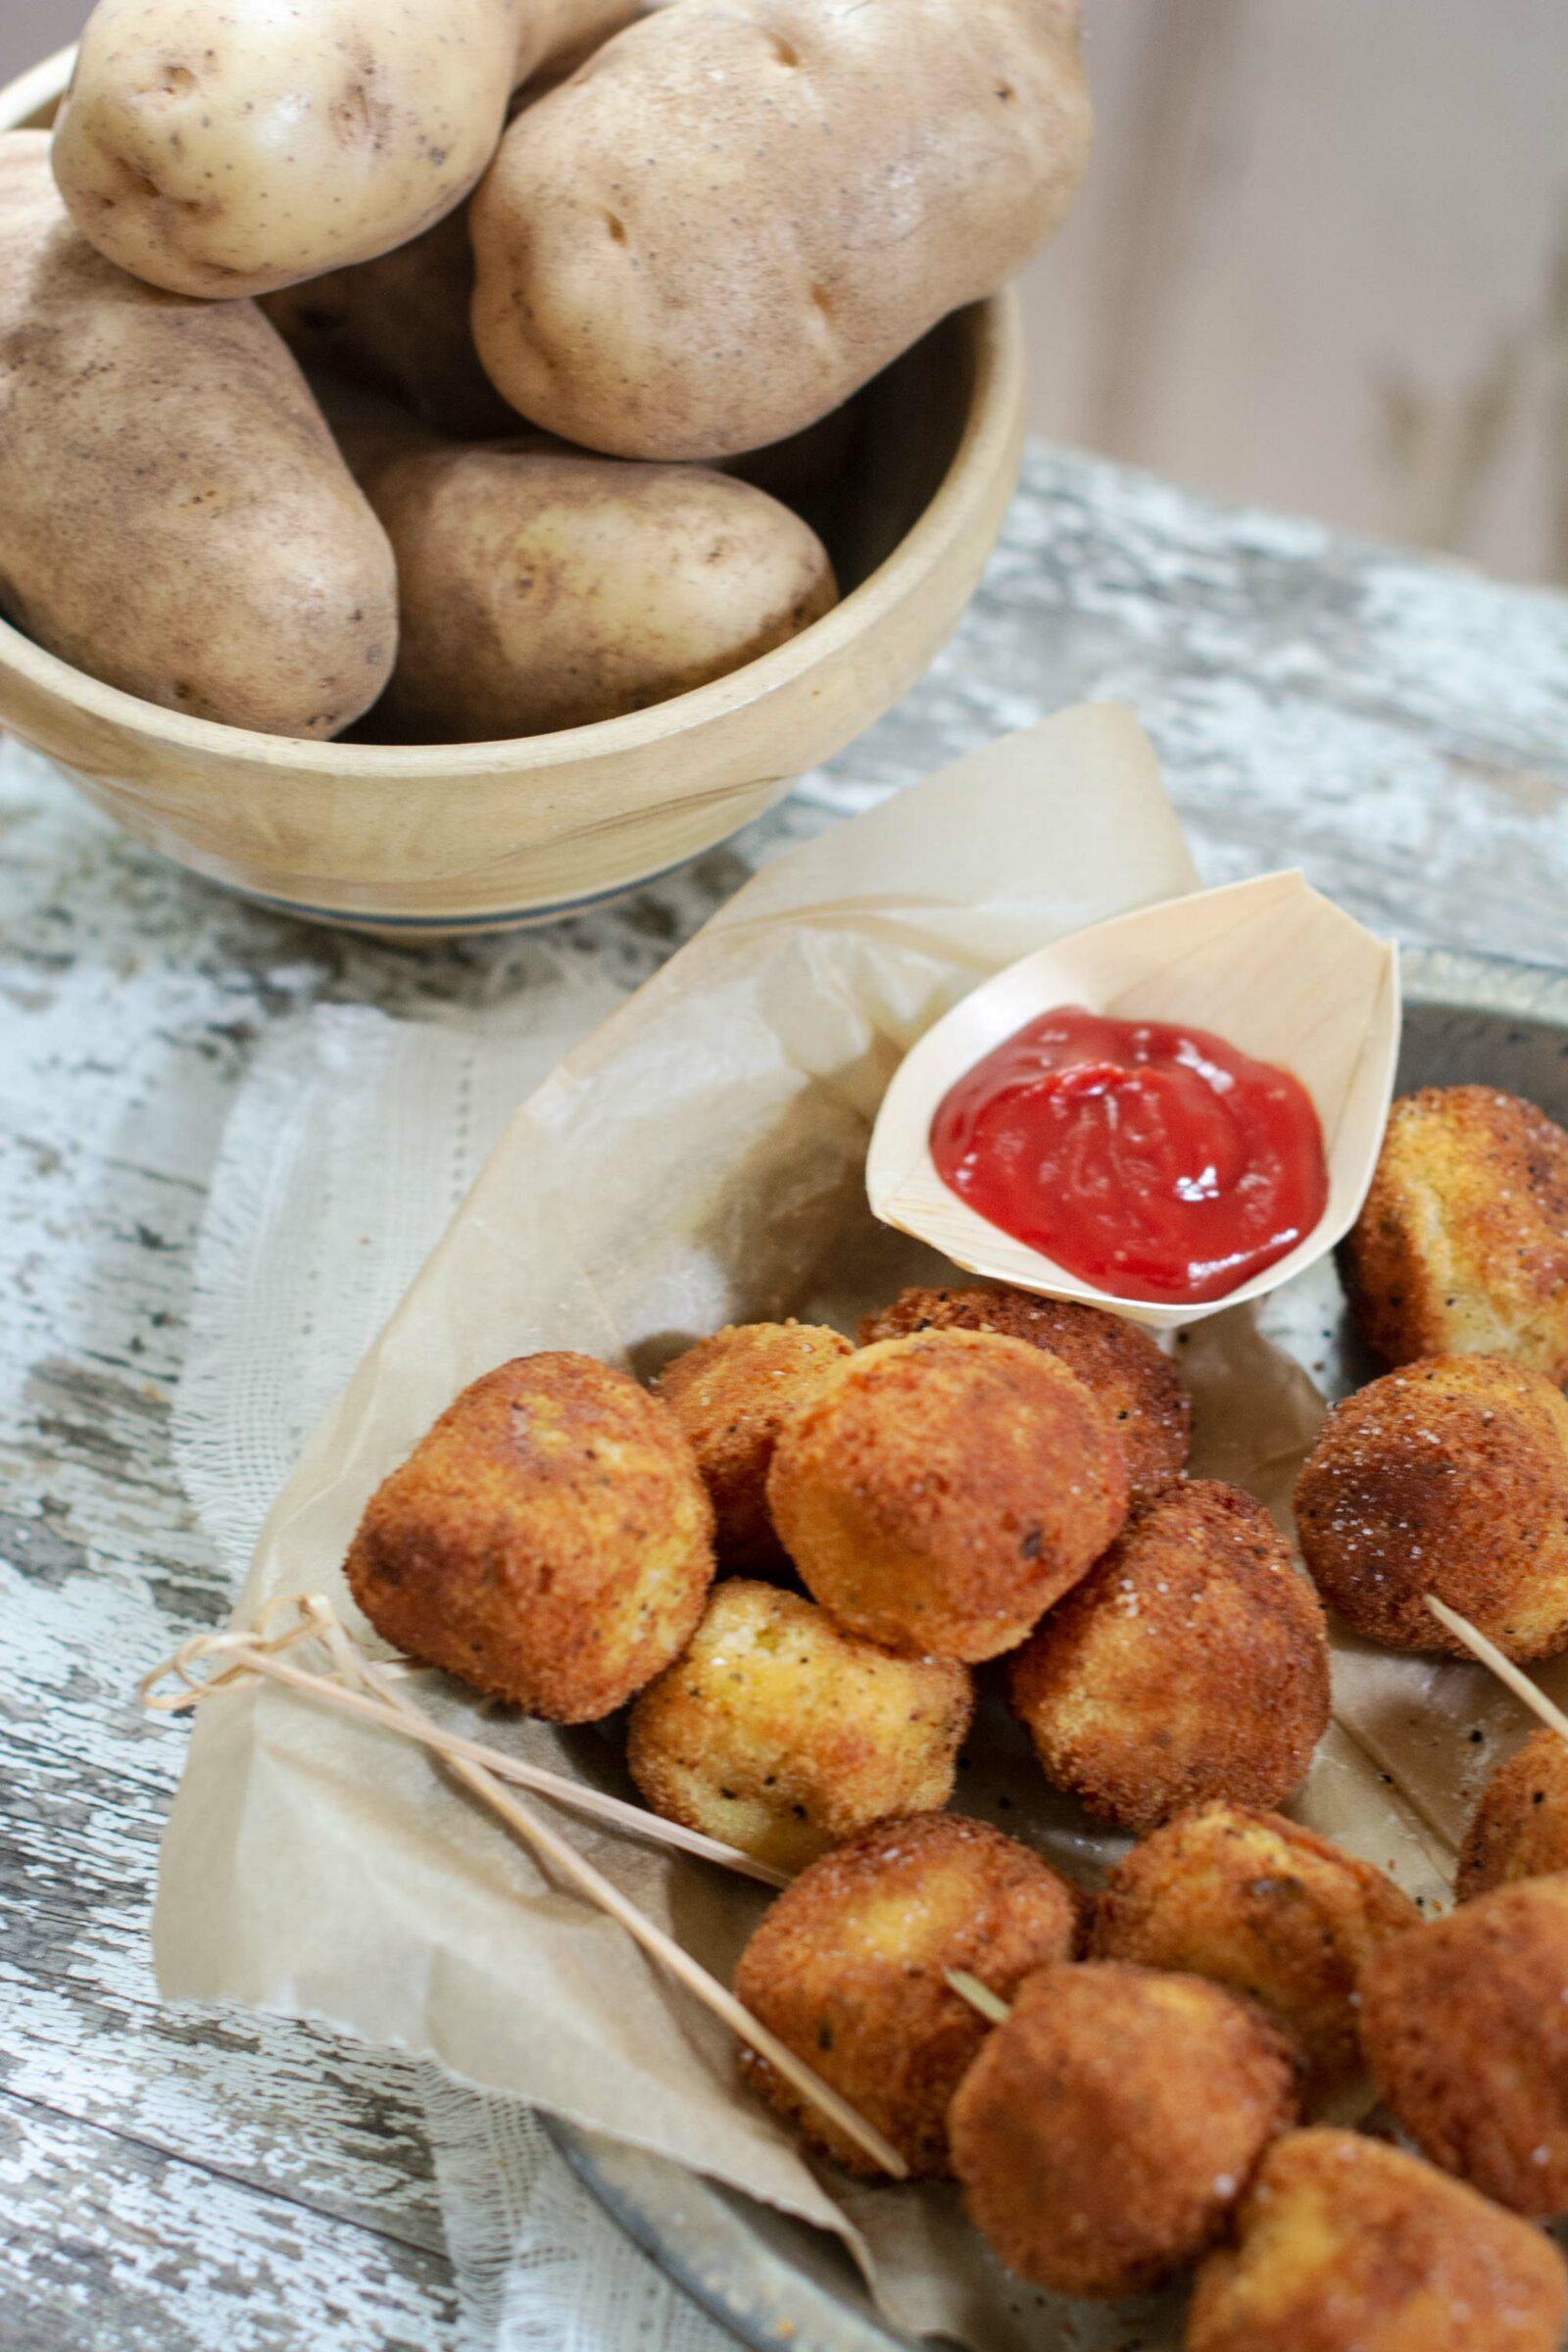 Idaho Potatoes make the ideal potato nuggets